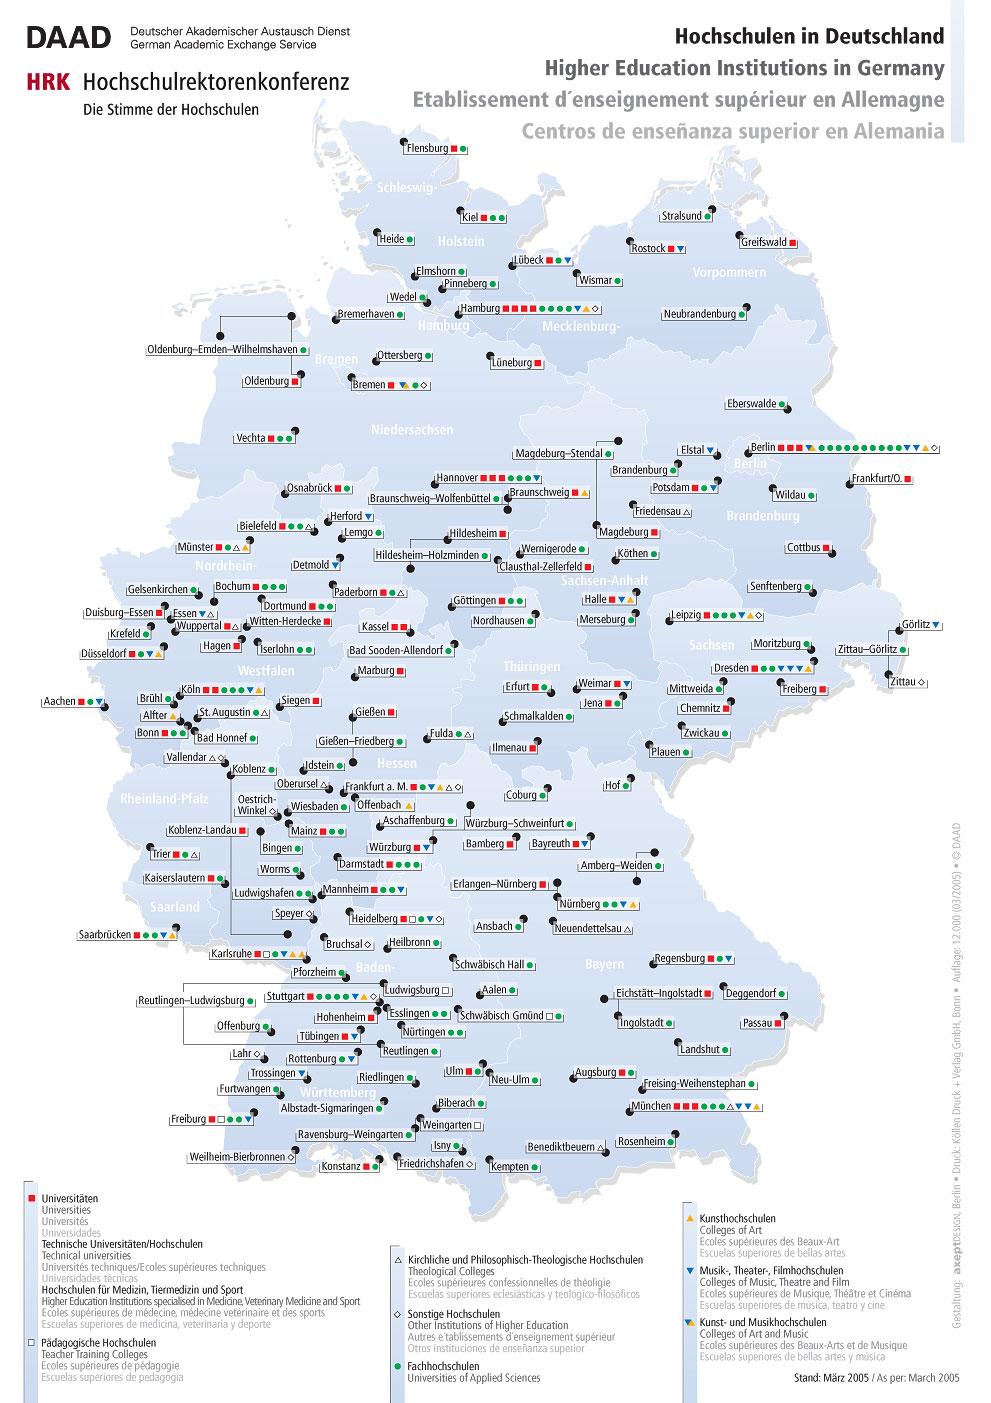 Centros de enseñanza superior en Alemania 2005